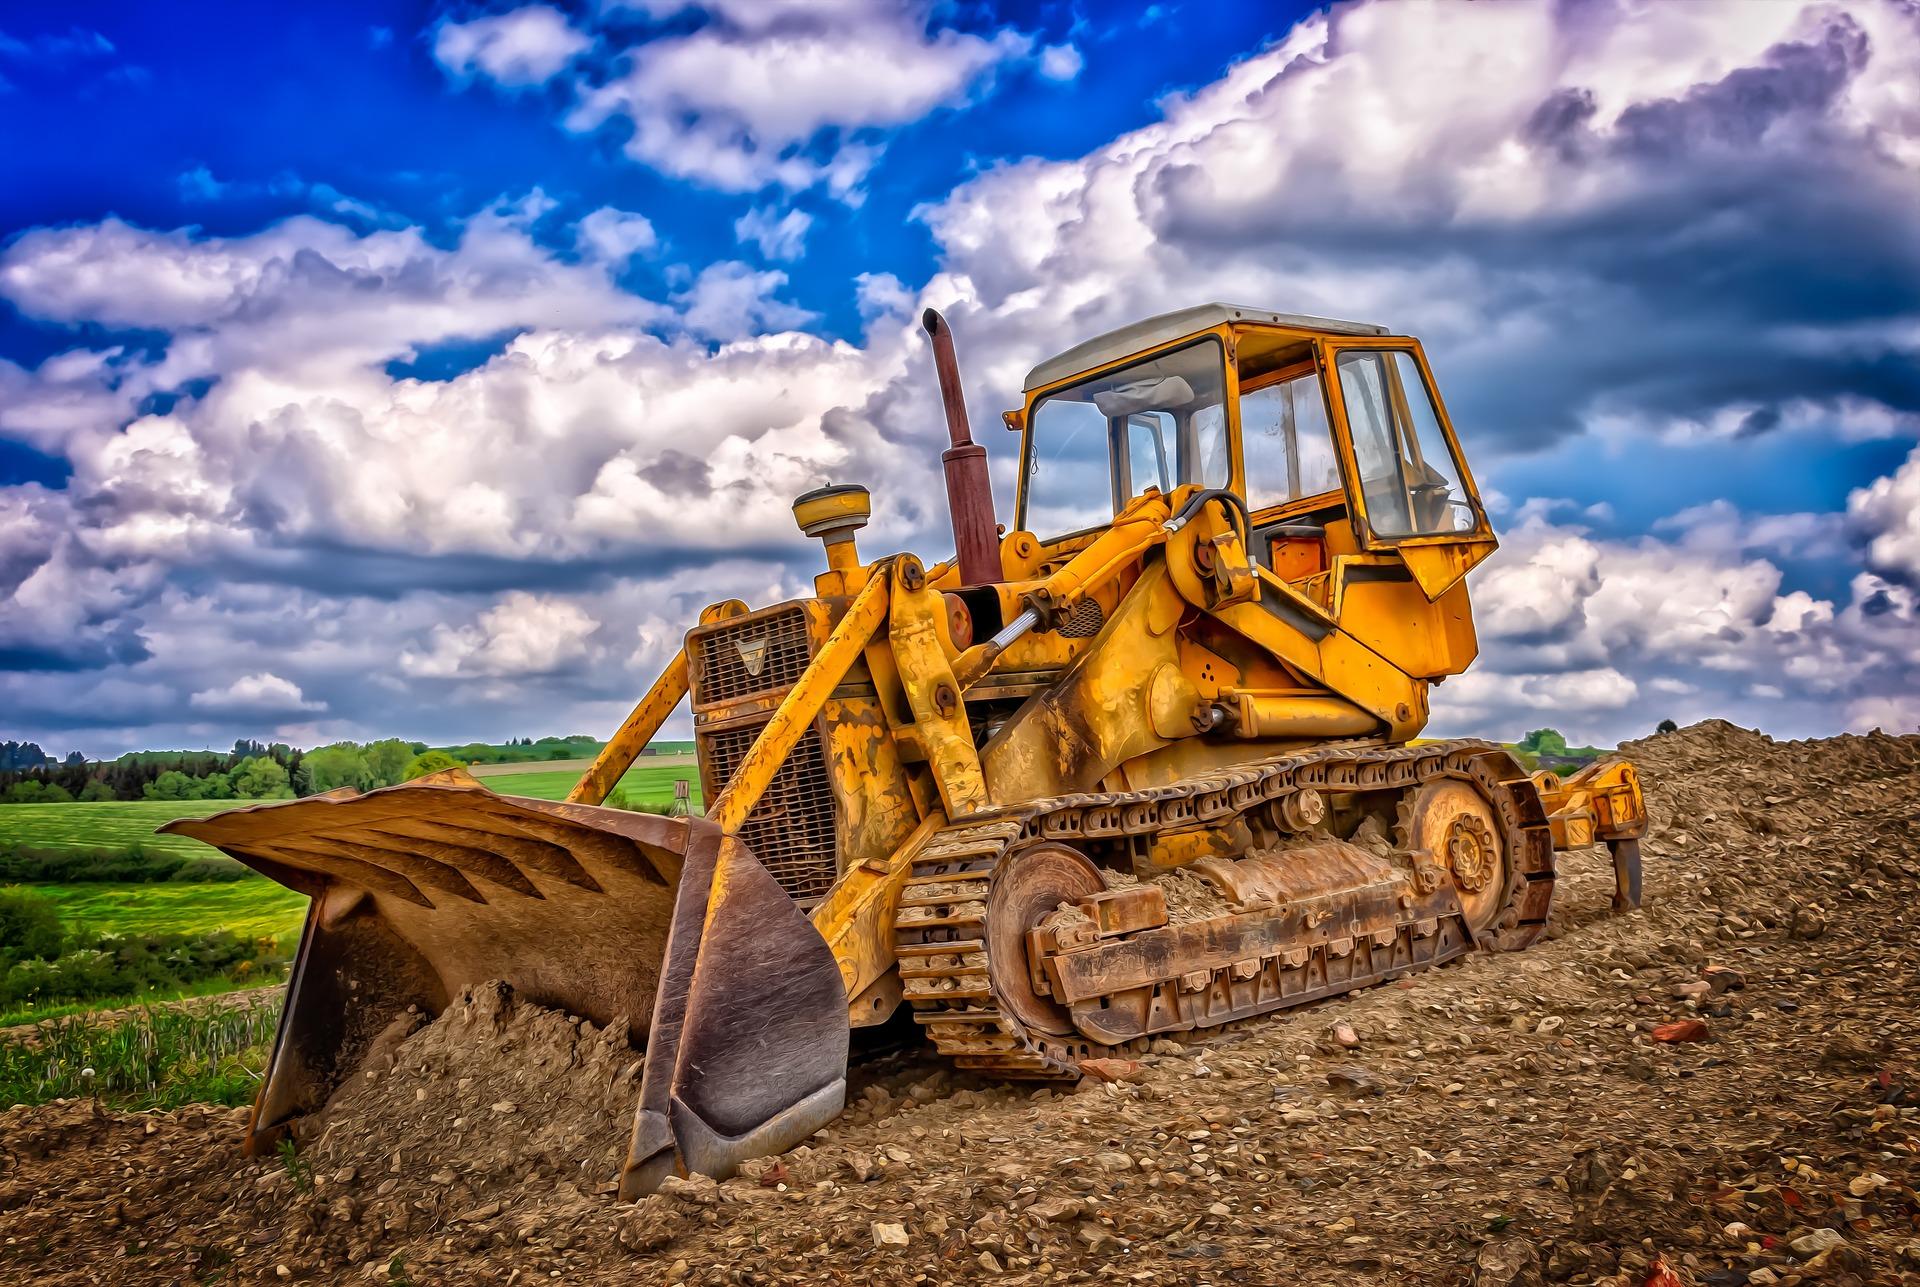 construction-machine-3412240_1920